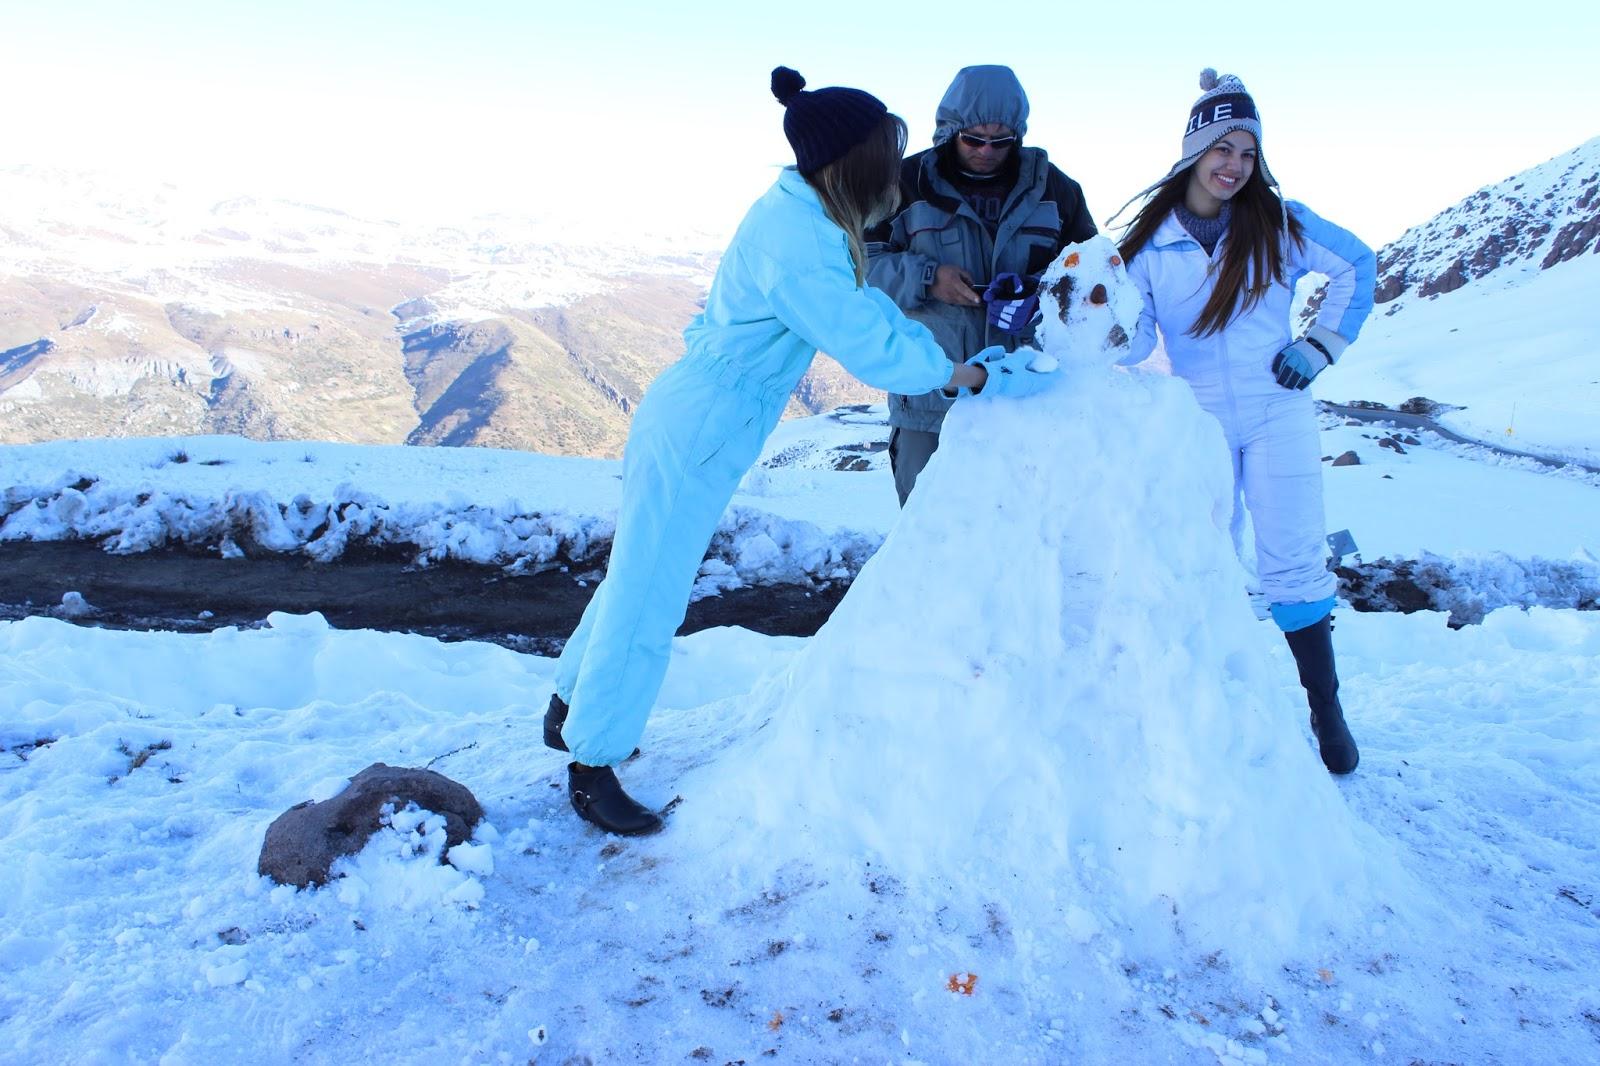 chile valle nevado fashion clues 13